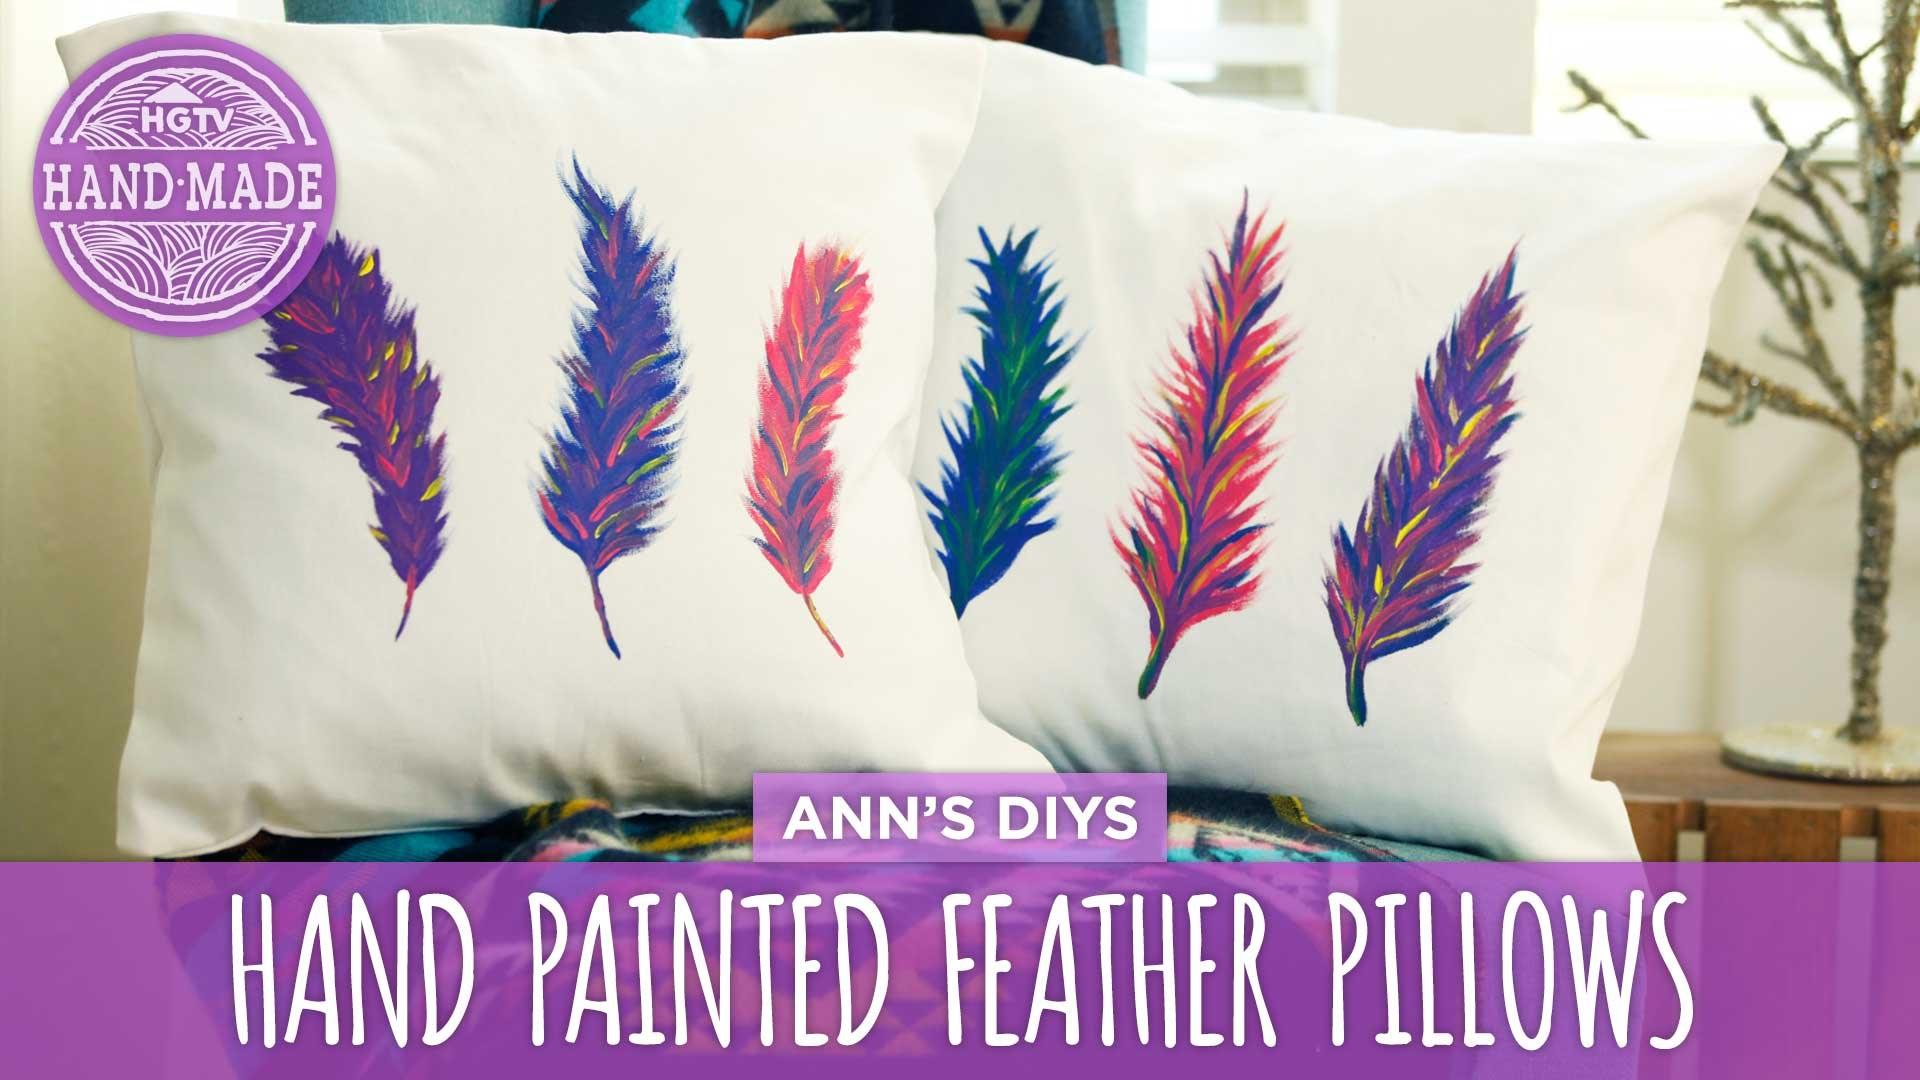 cushion colorful room decor pastel scandinavian kids peach nursery decorative pillow modern pin pillows geometric cover